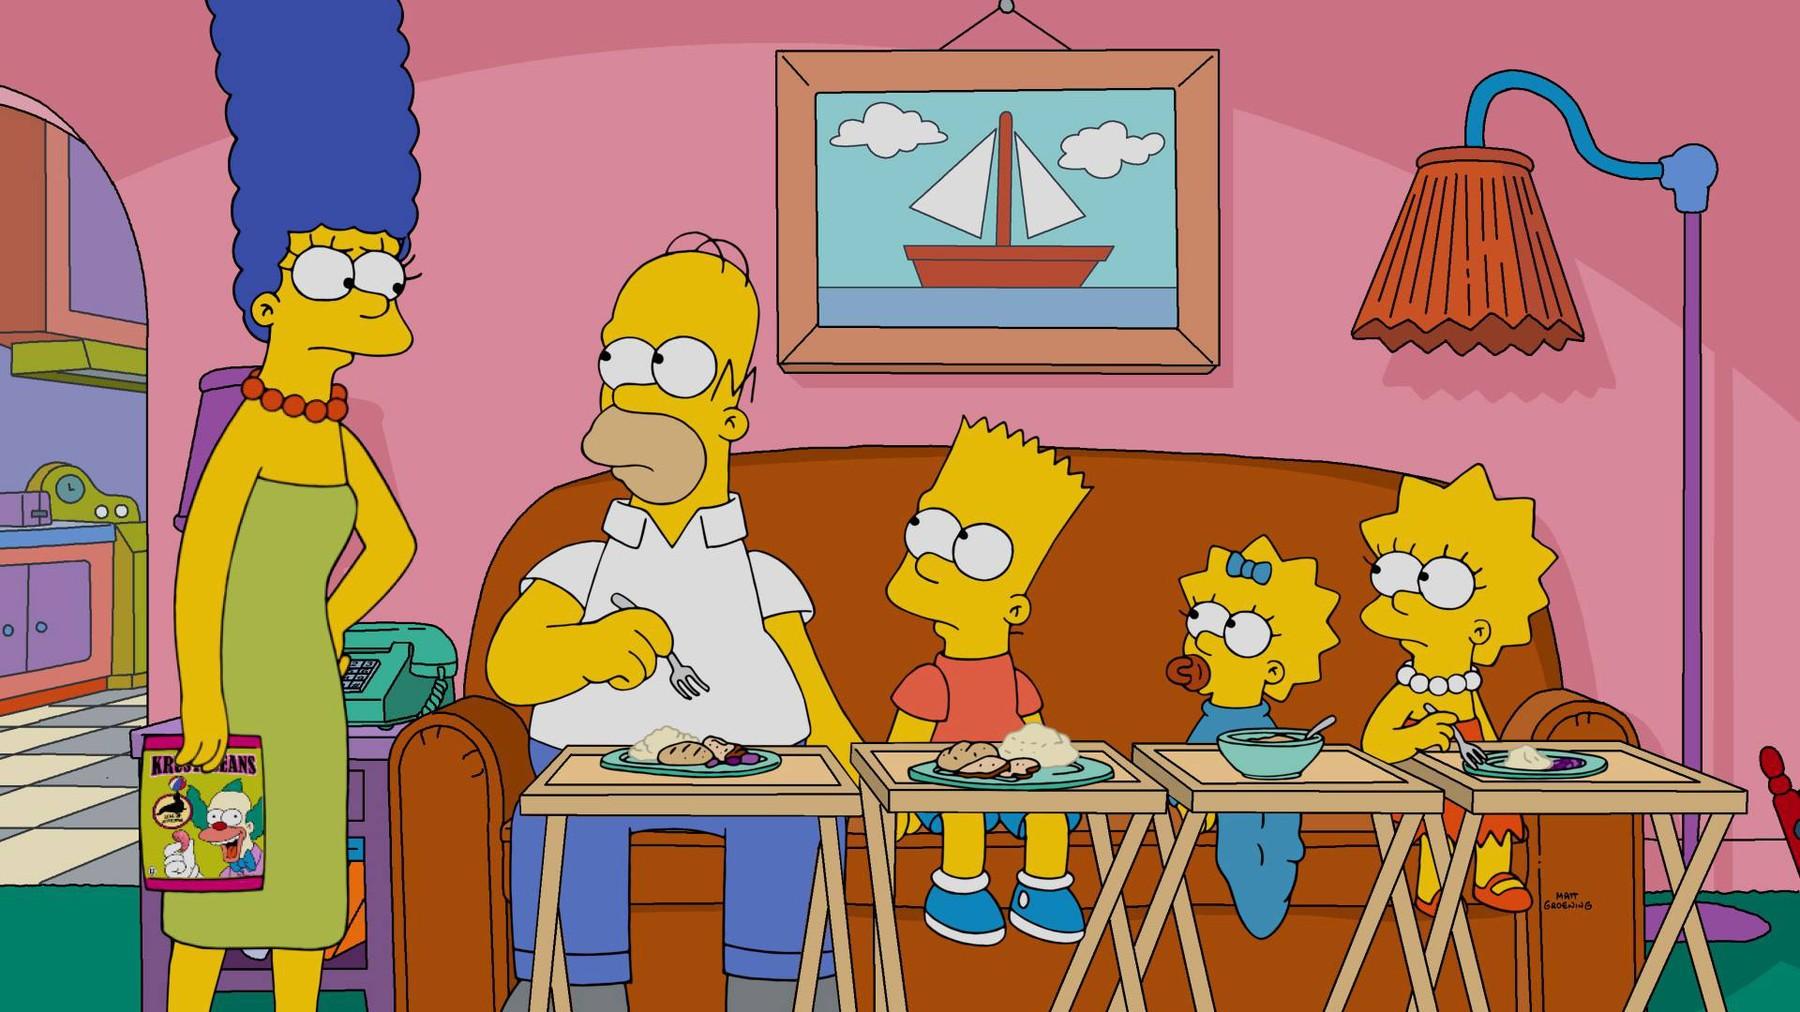 Simpsoni - Marge, Homer, Bart, Maggie i Lisa